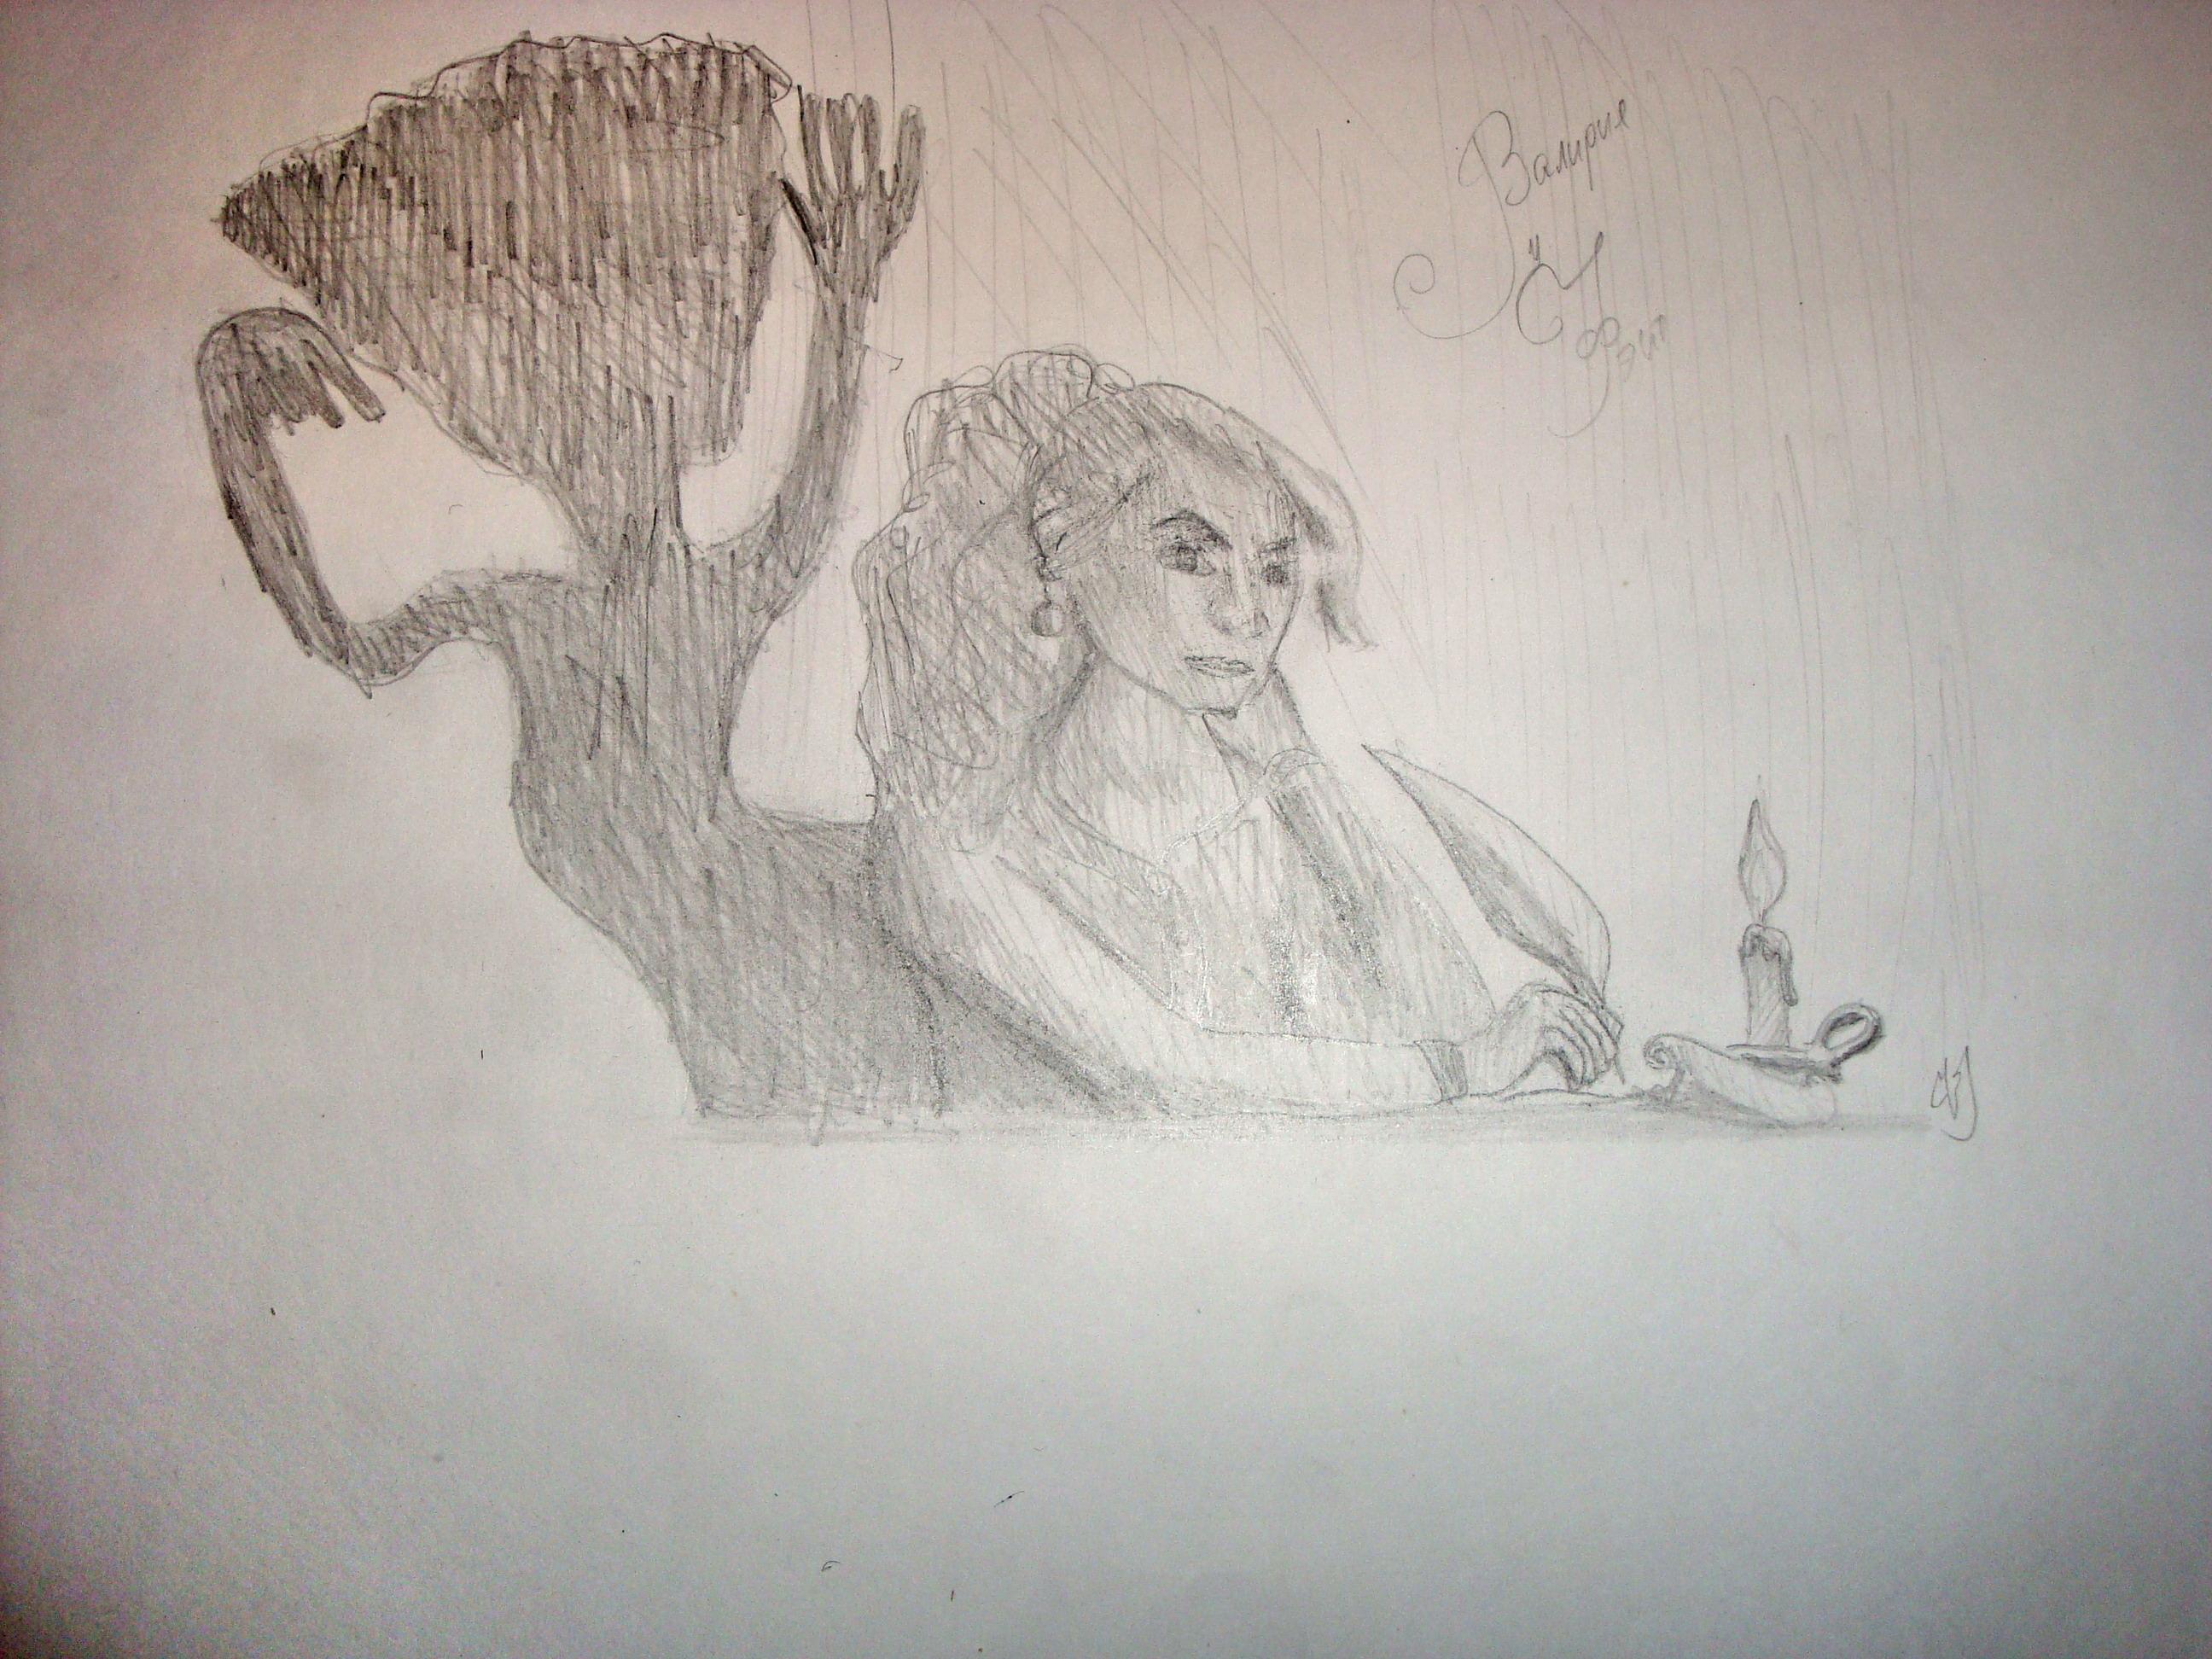 http://pix.playground.ru/download/gallery/431810/2eaebed61cd946737c0982539145b6cc.jpg